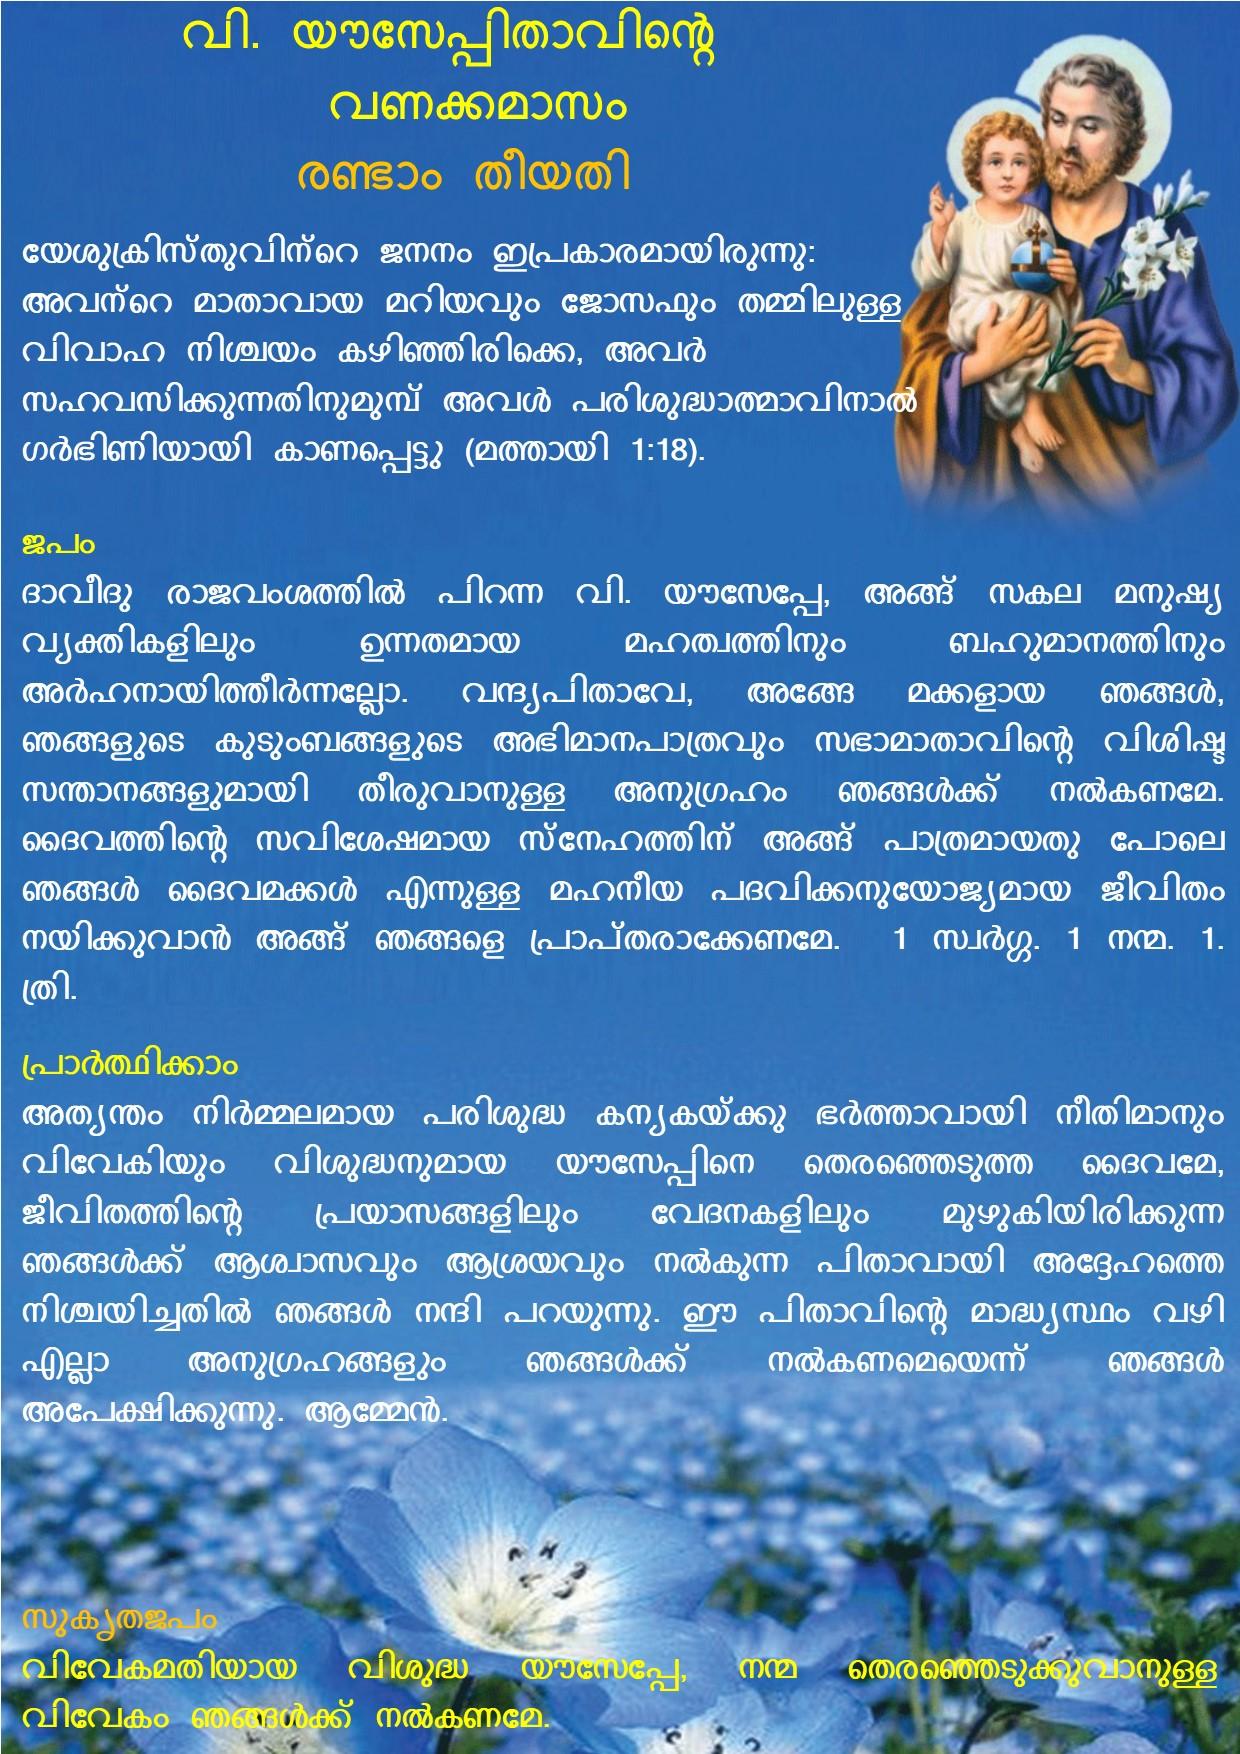 Vanakkamasam, St Joseph, March 02